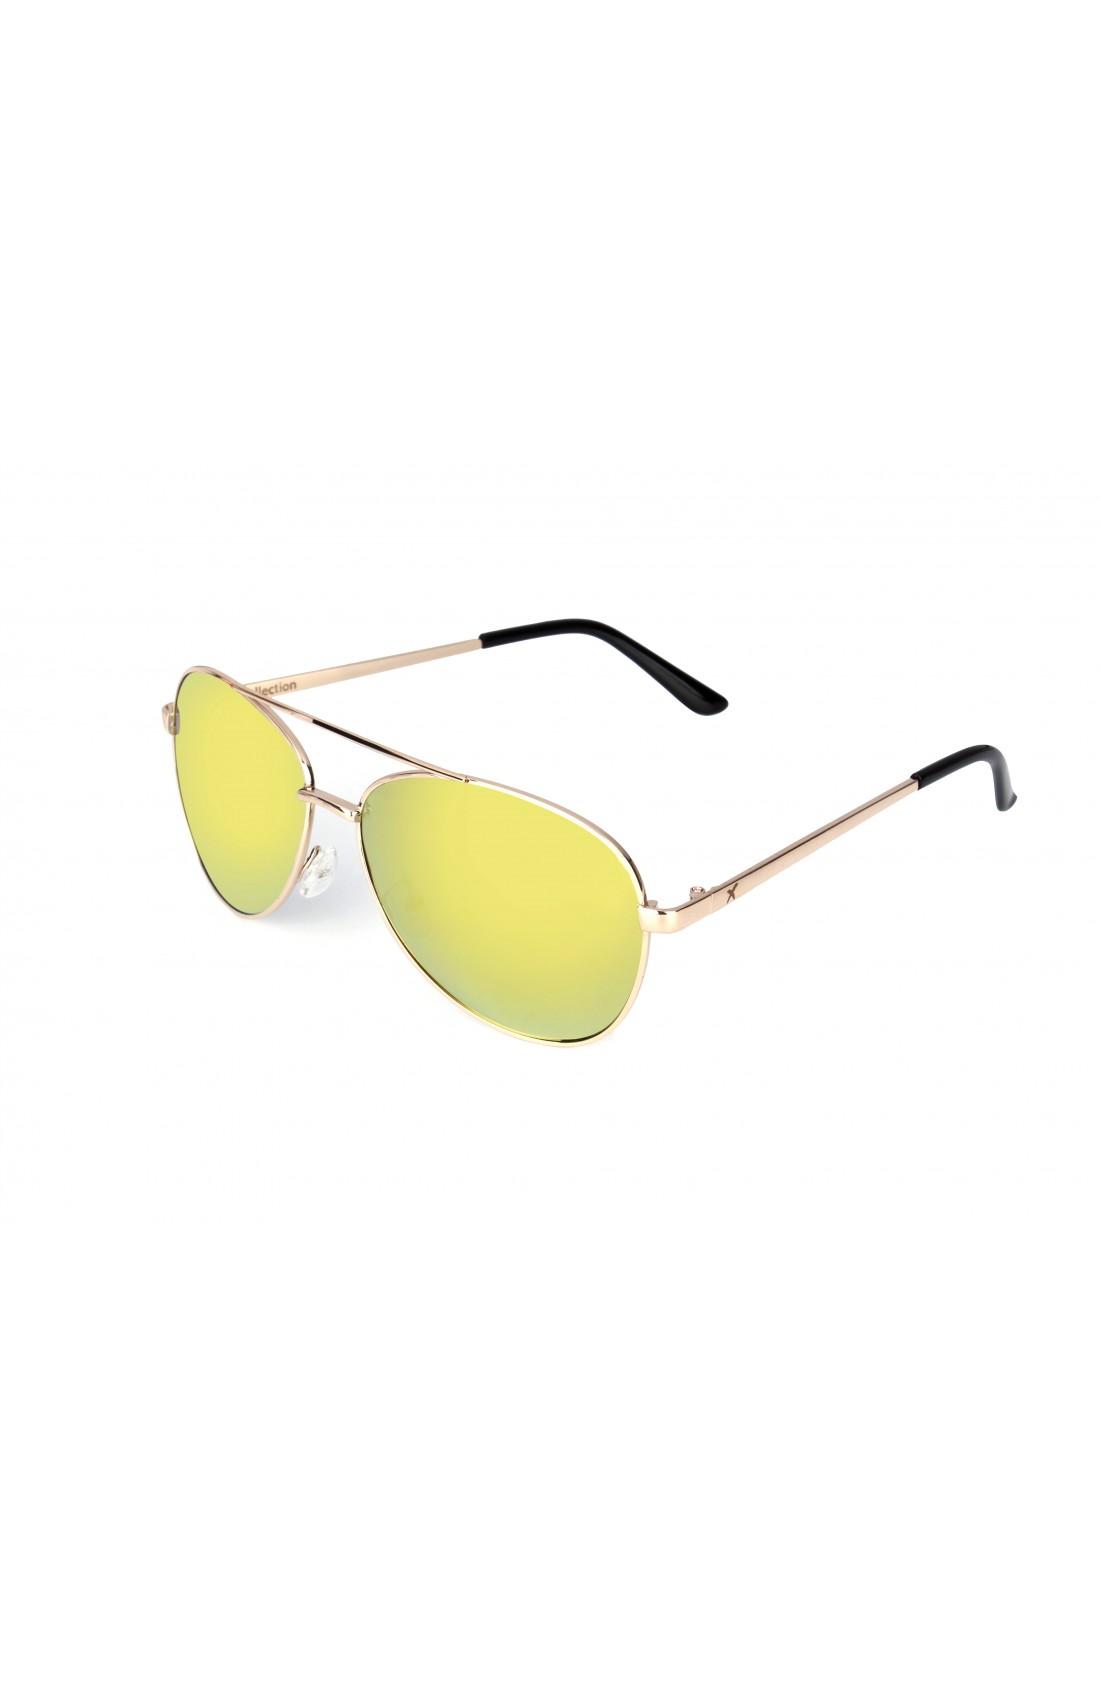 Sunglasses Style M01123B